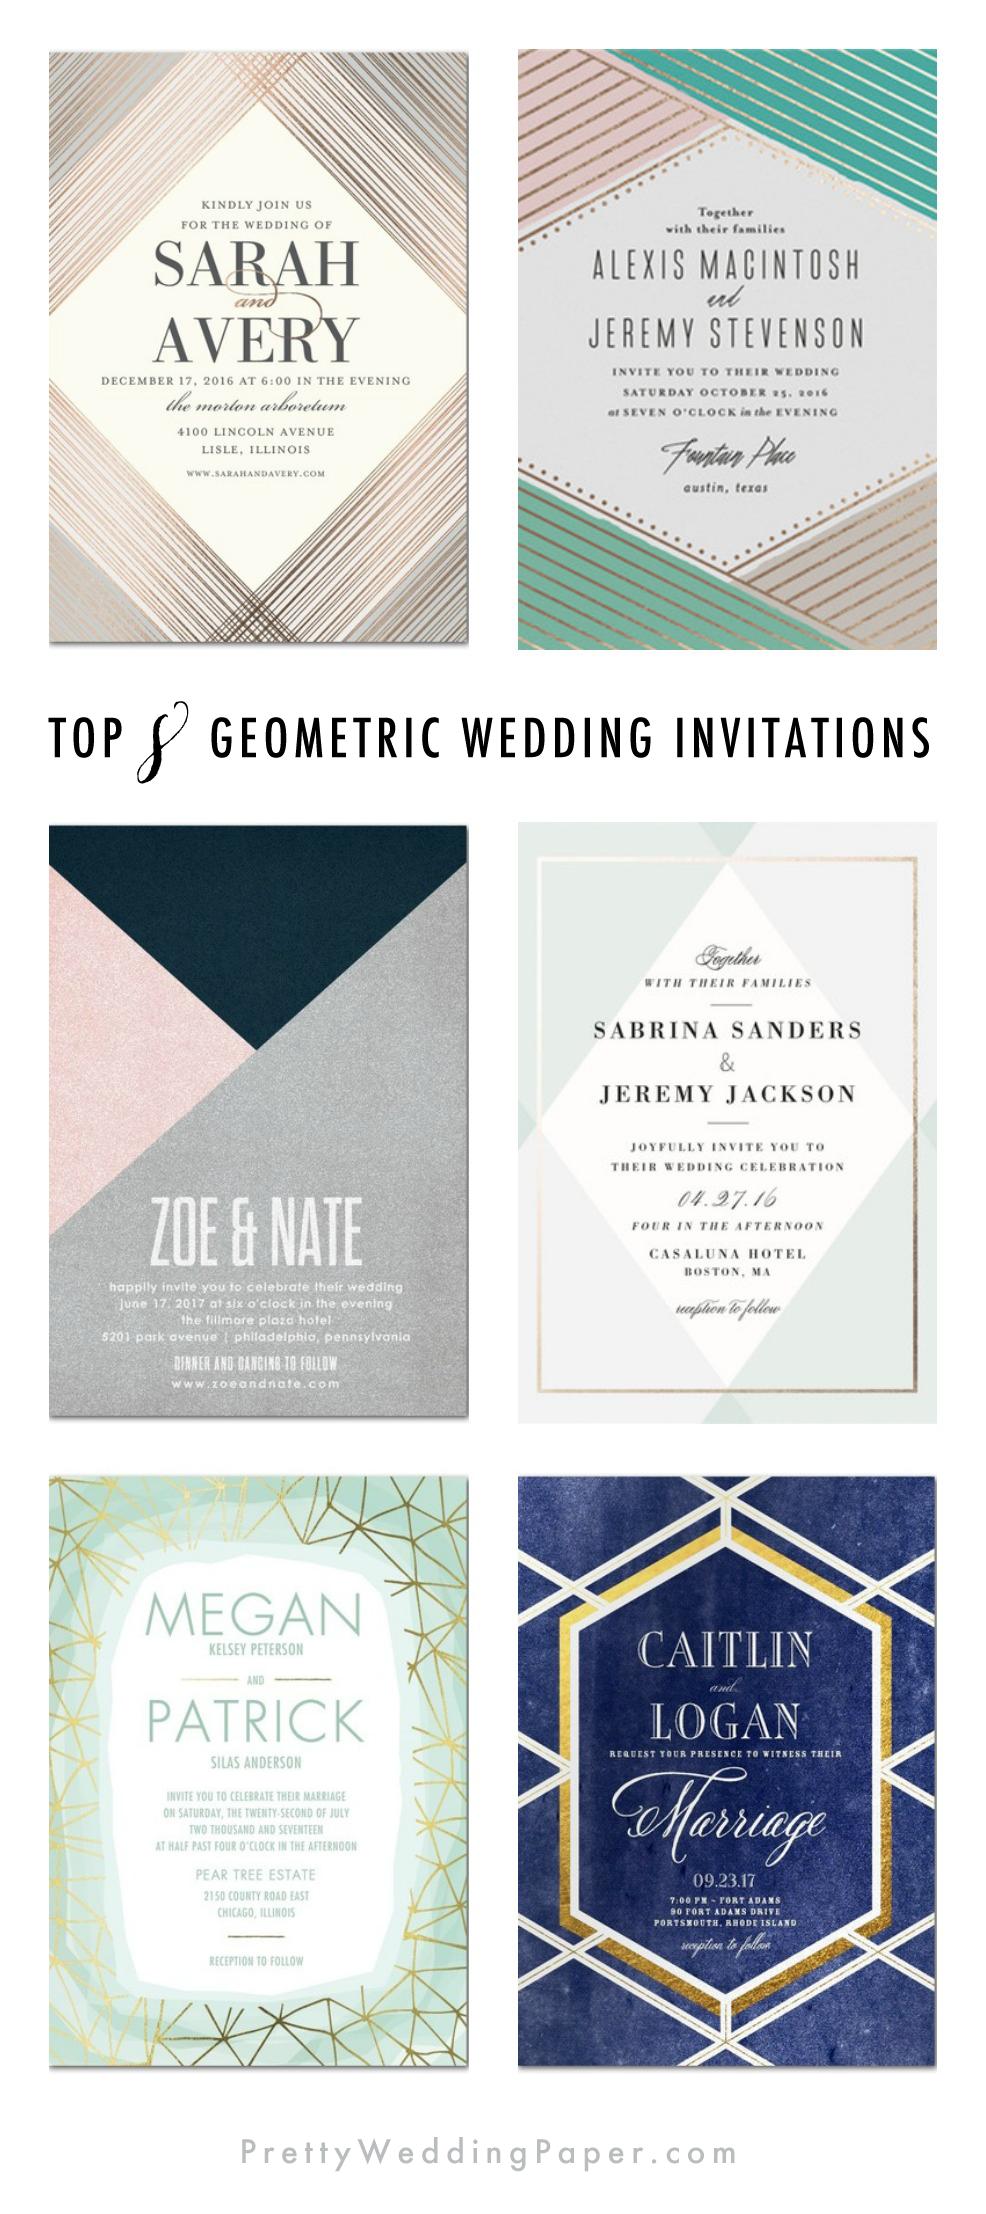 Top 8 Geometric Wedding Invitations: Pretty & Modern